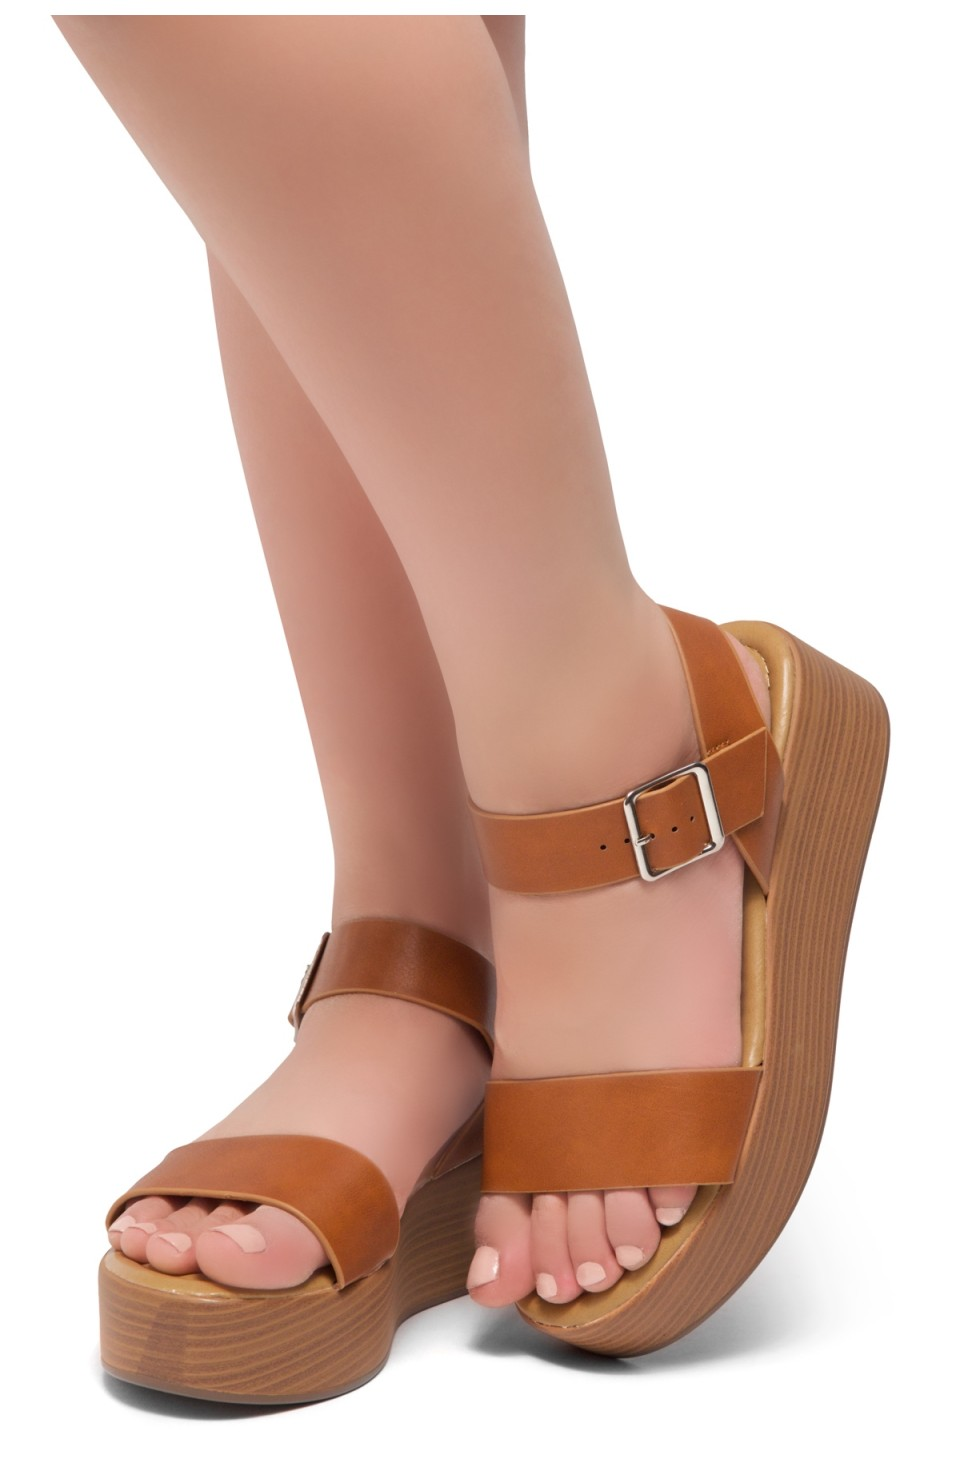 HerStyle Carita- Open Toe Ankle Strap Platform Wedge (Cognac/Wood)